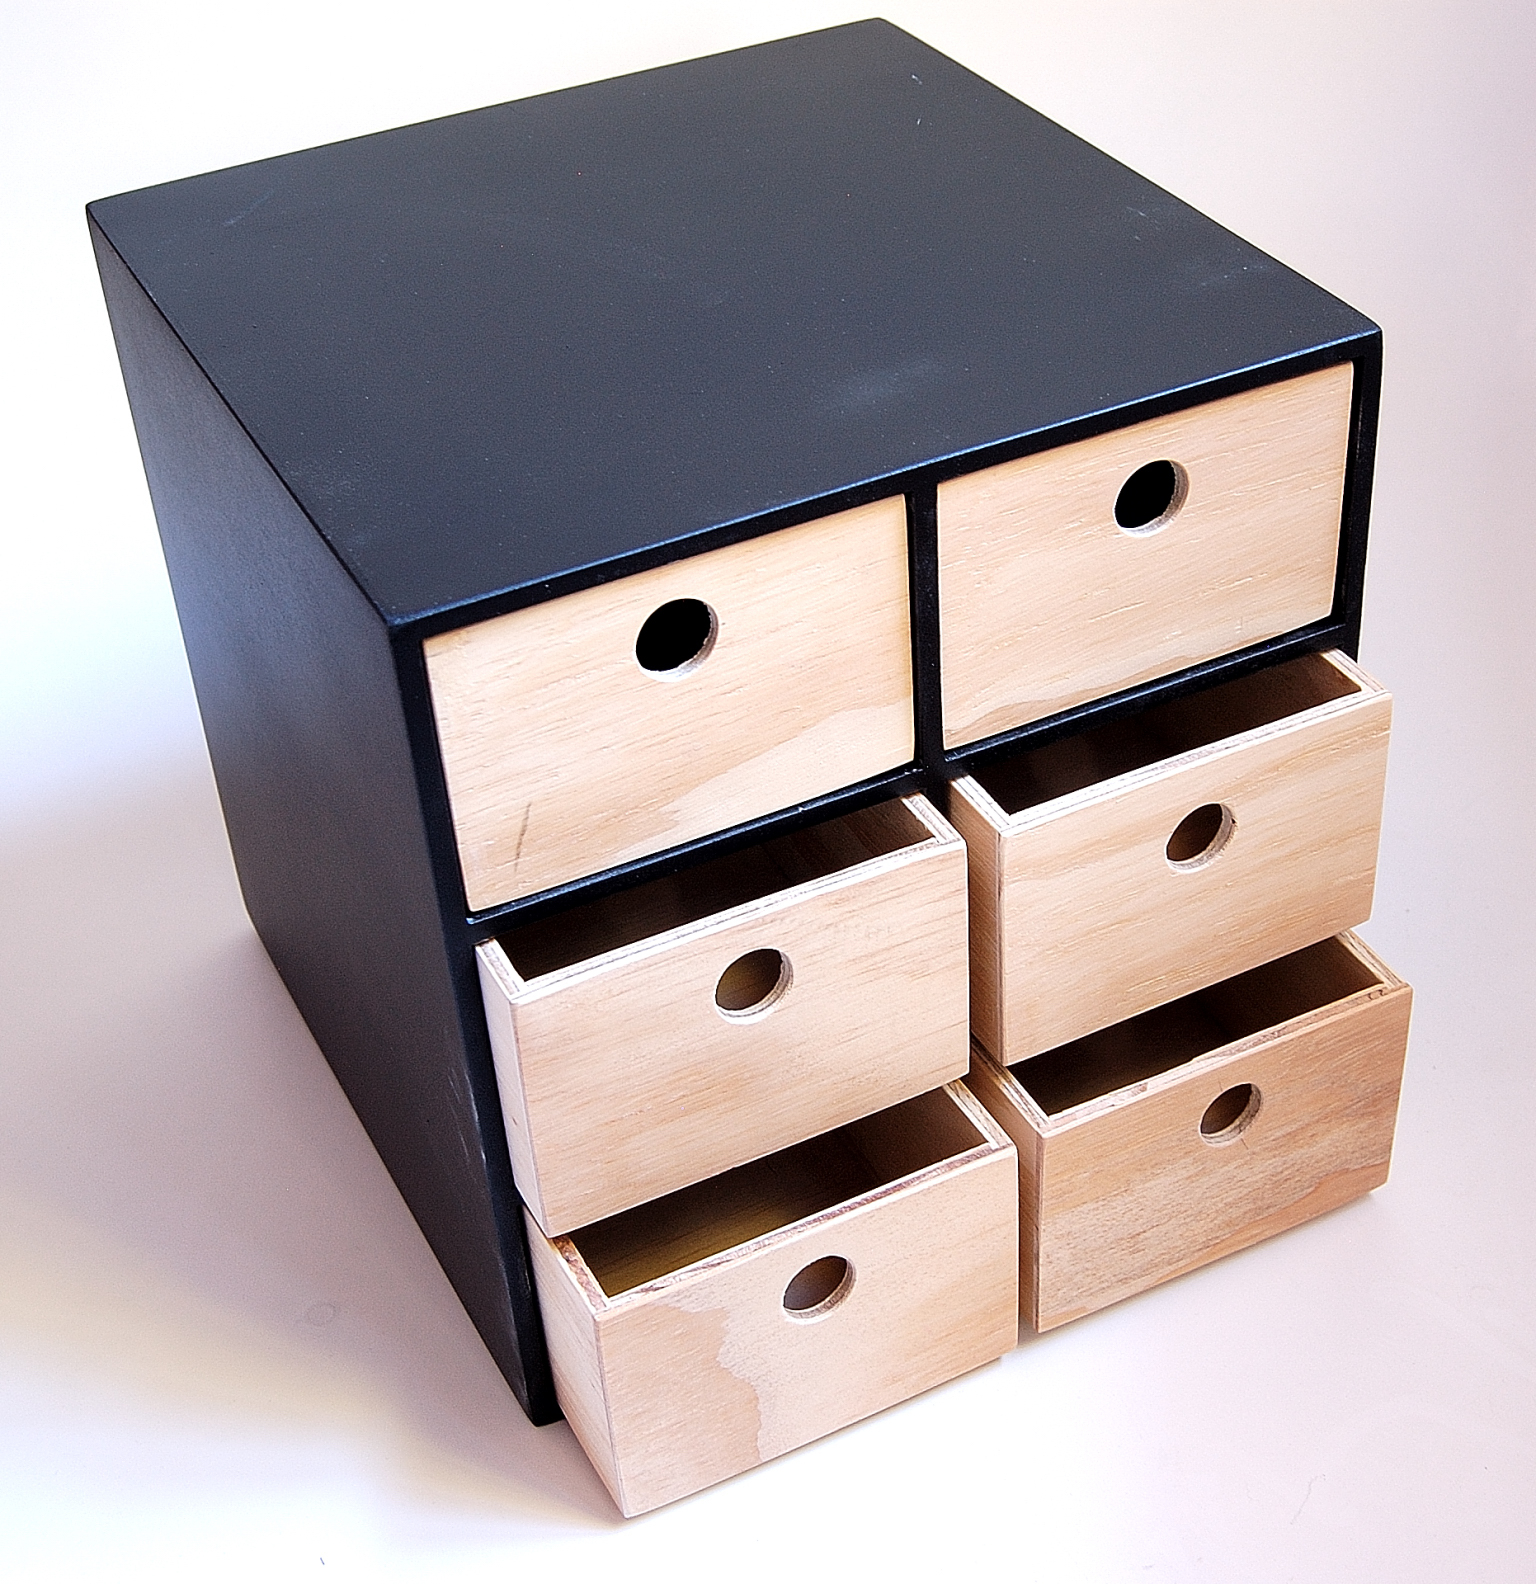 6 Drawer Utility Storage Box - No Handle - Black Frame - Wood